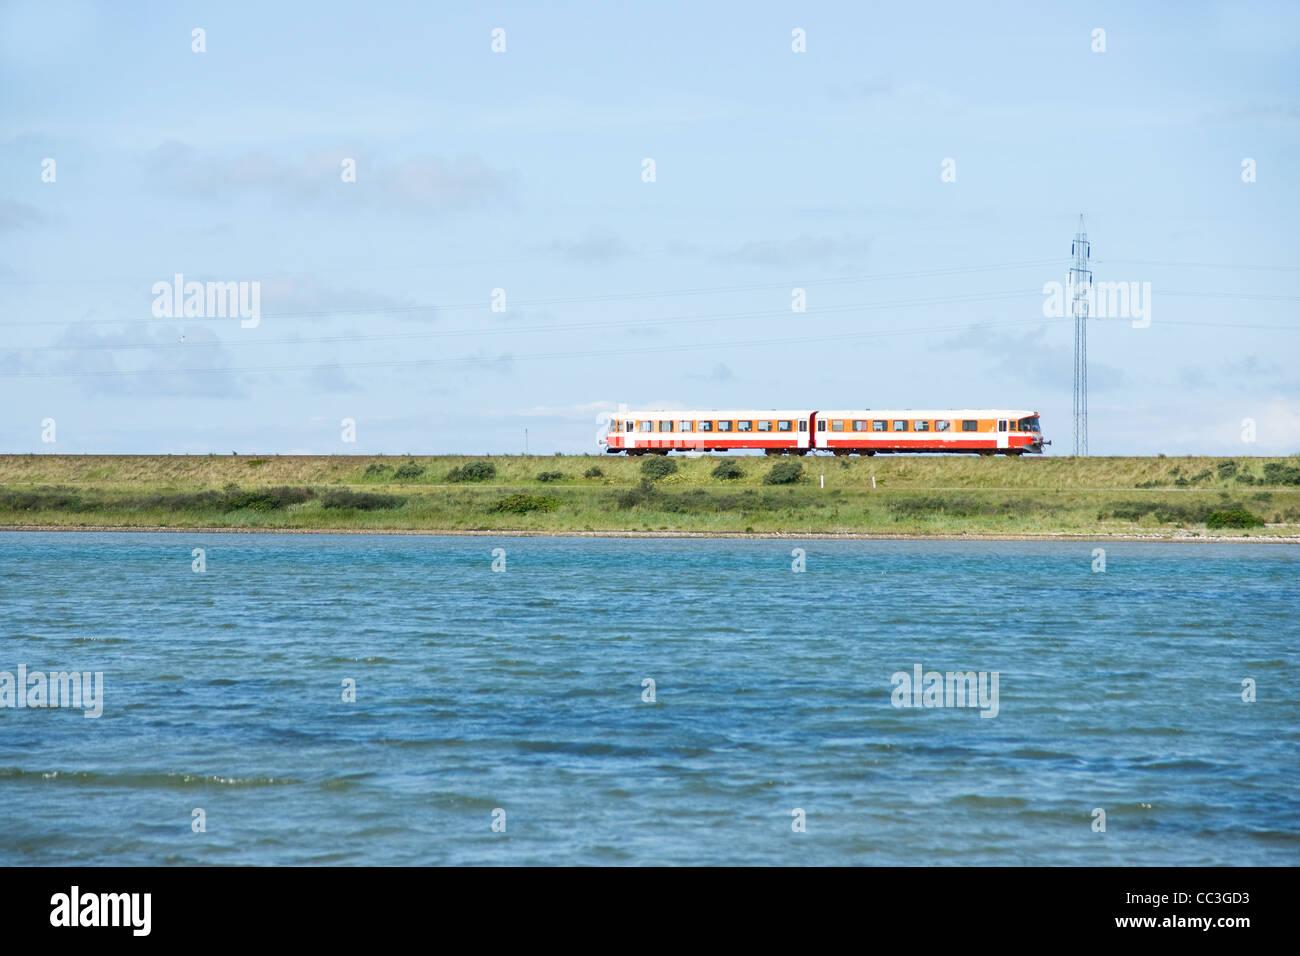 Small train in Denmark - Stock Image